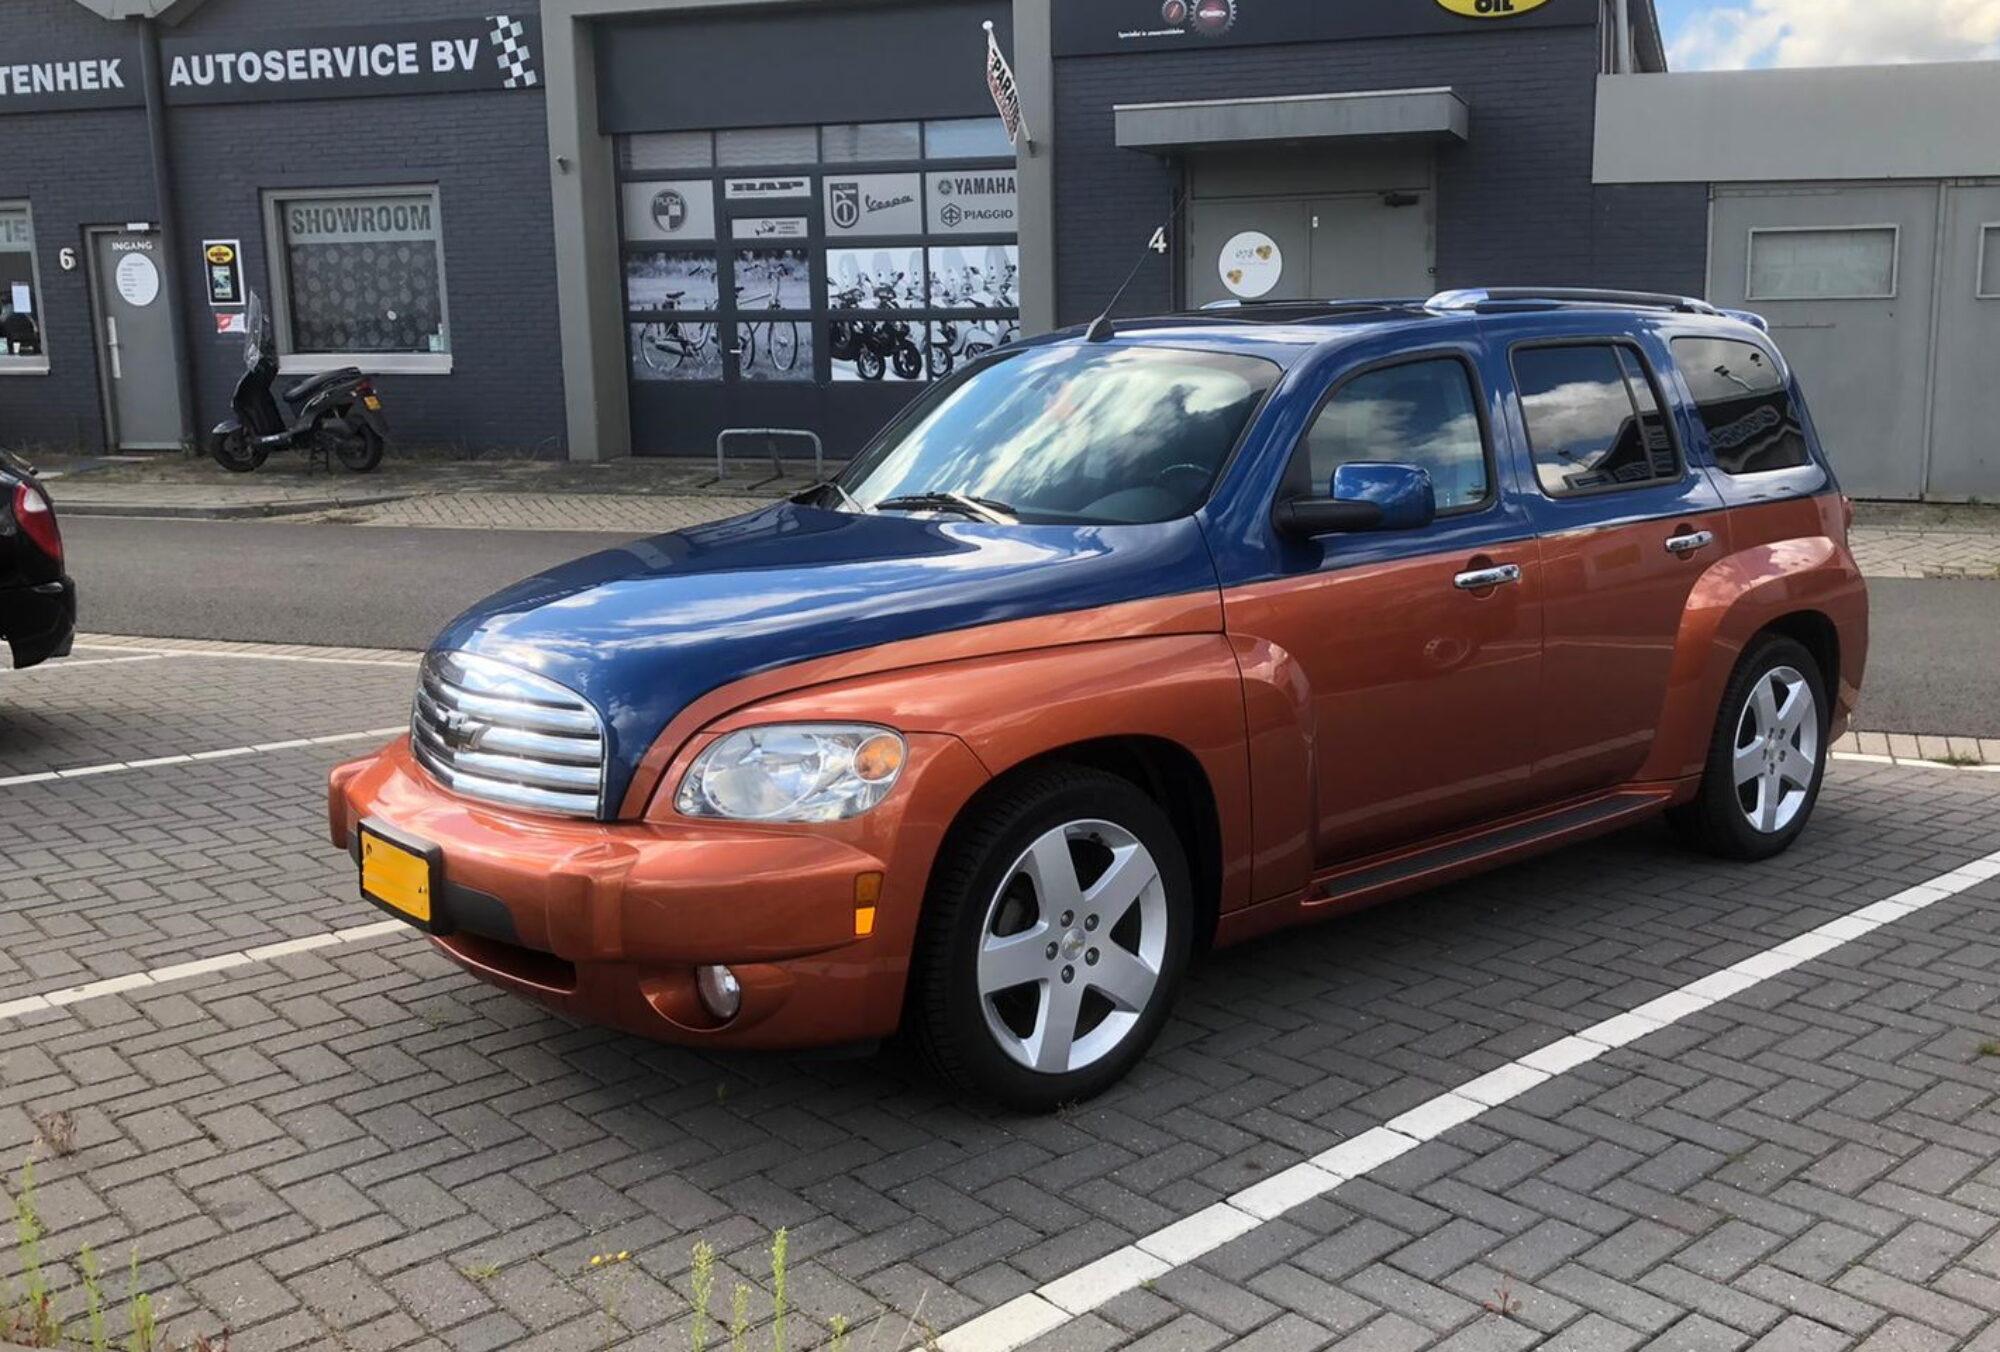 Auto Schade Centrum Dordrecht